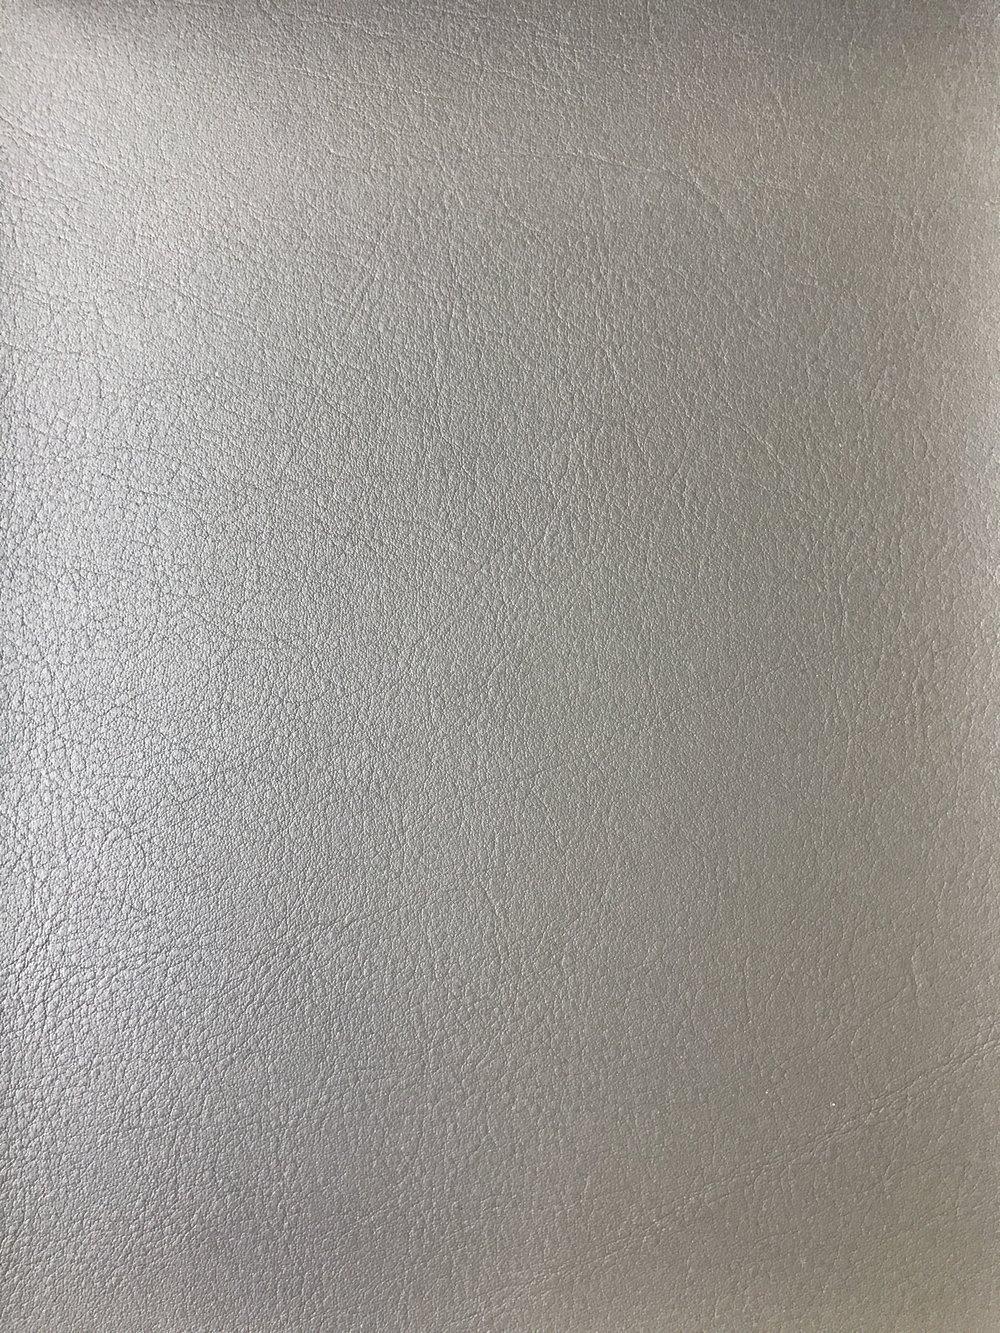 B22 Charcoal Grey